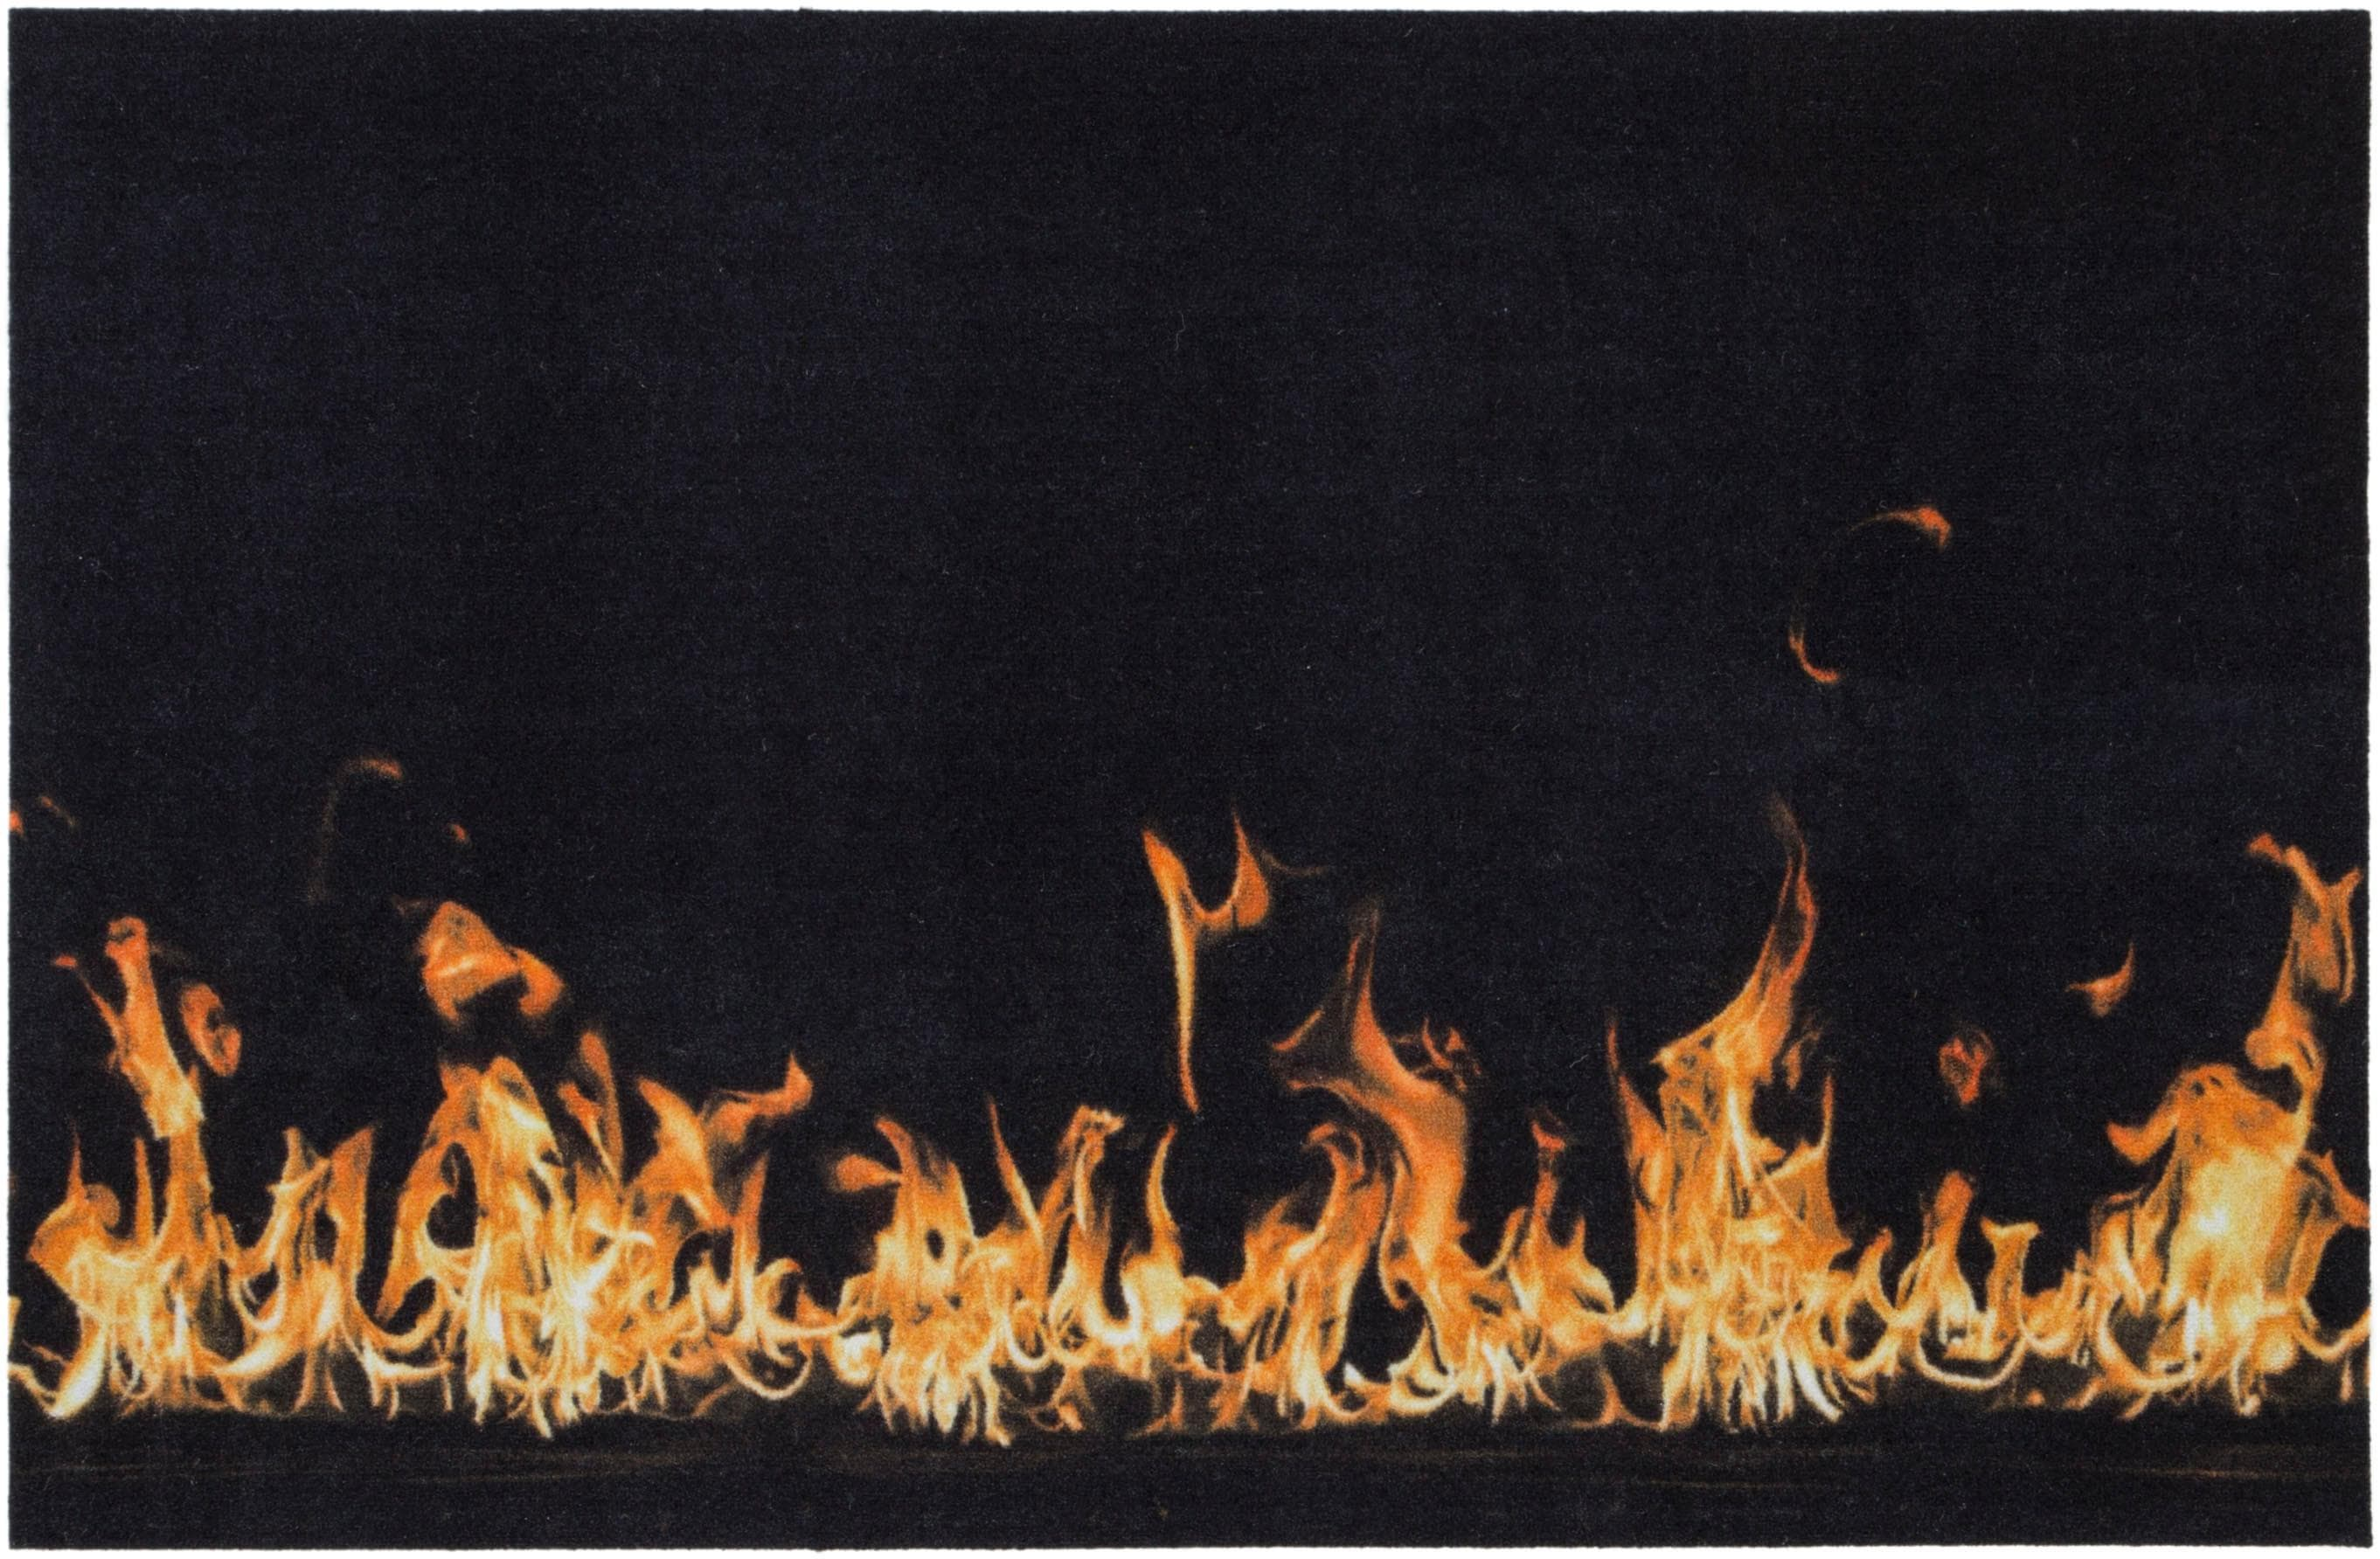 Fußmatte Flammen Andiamo rechteckig Höhe 5 mm maschinell gewebt